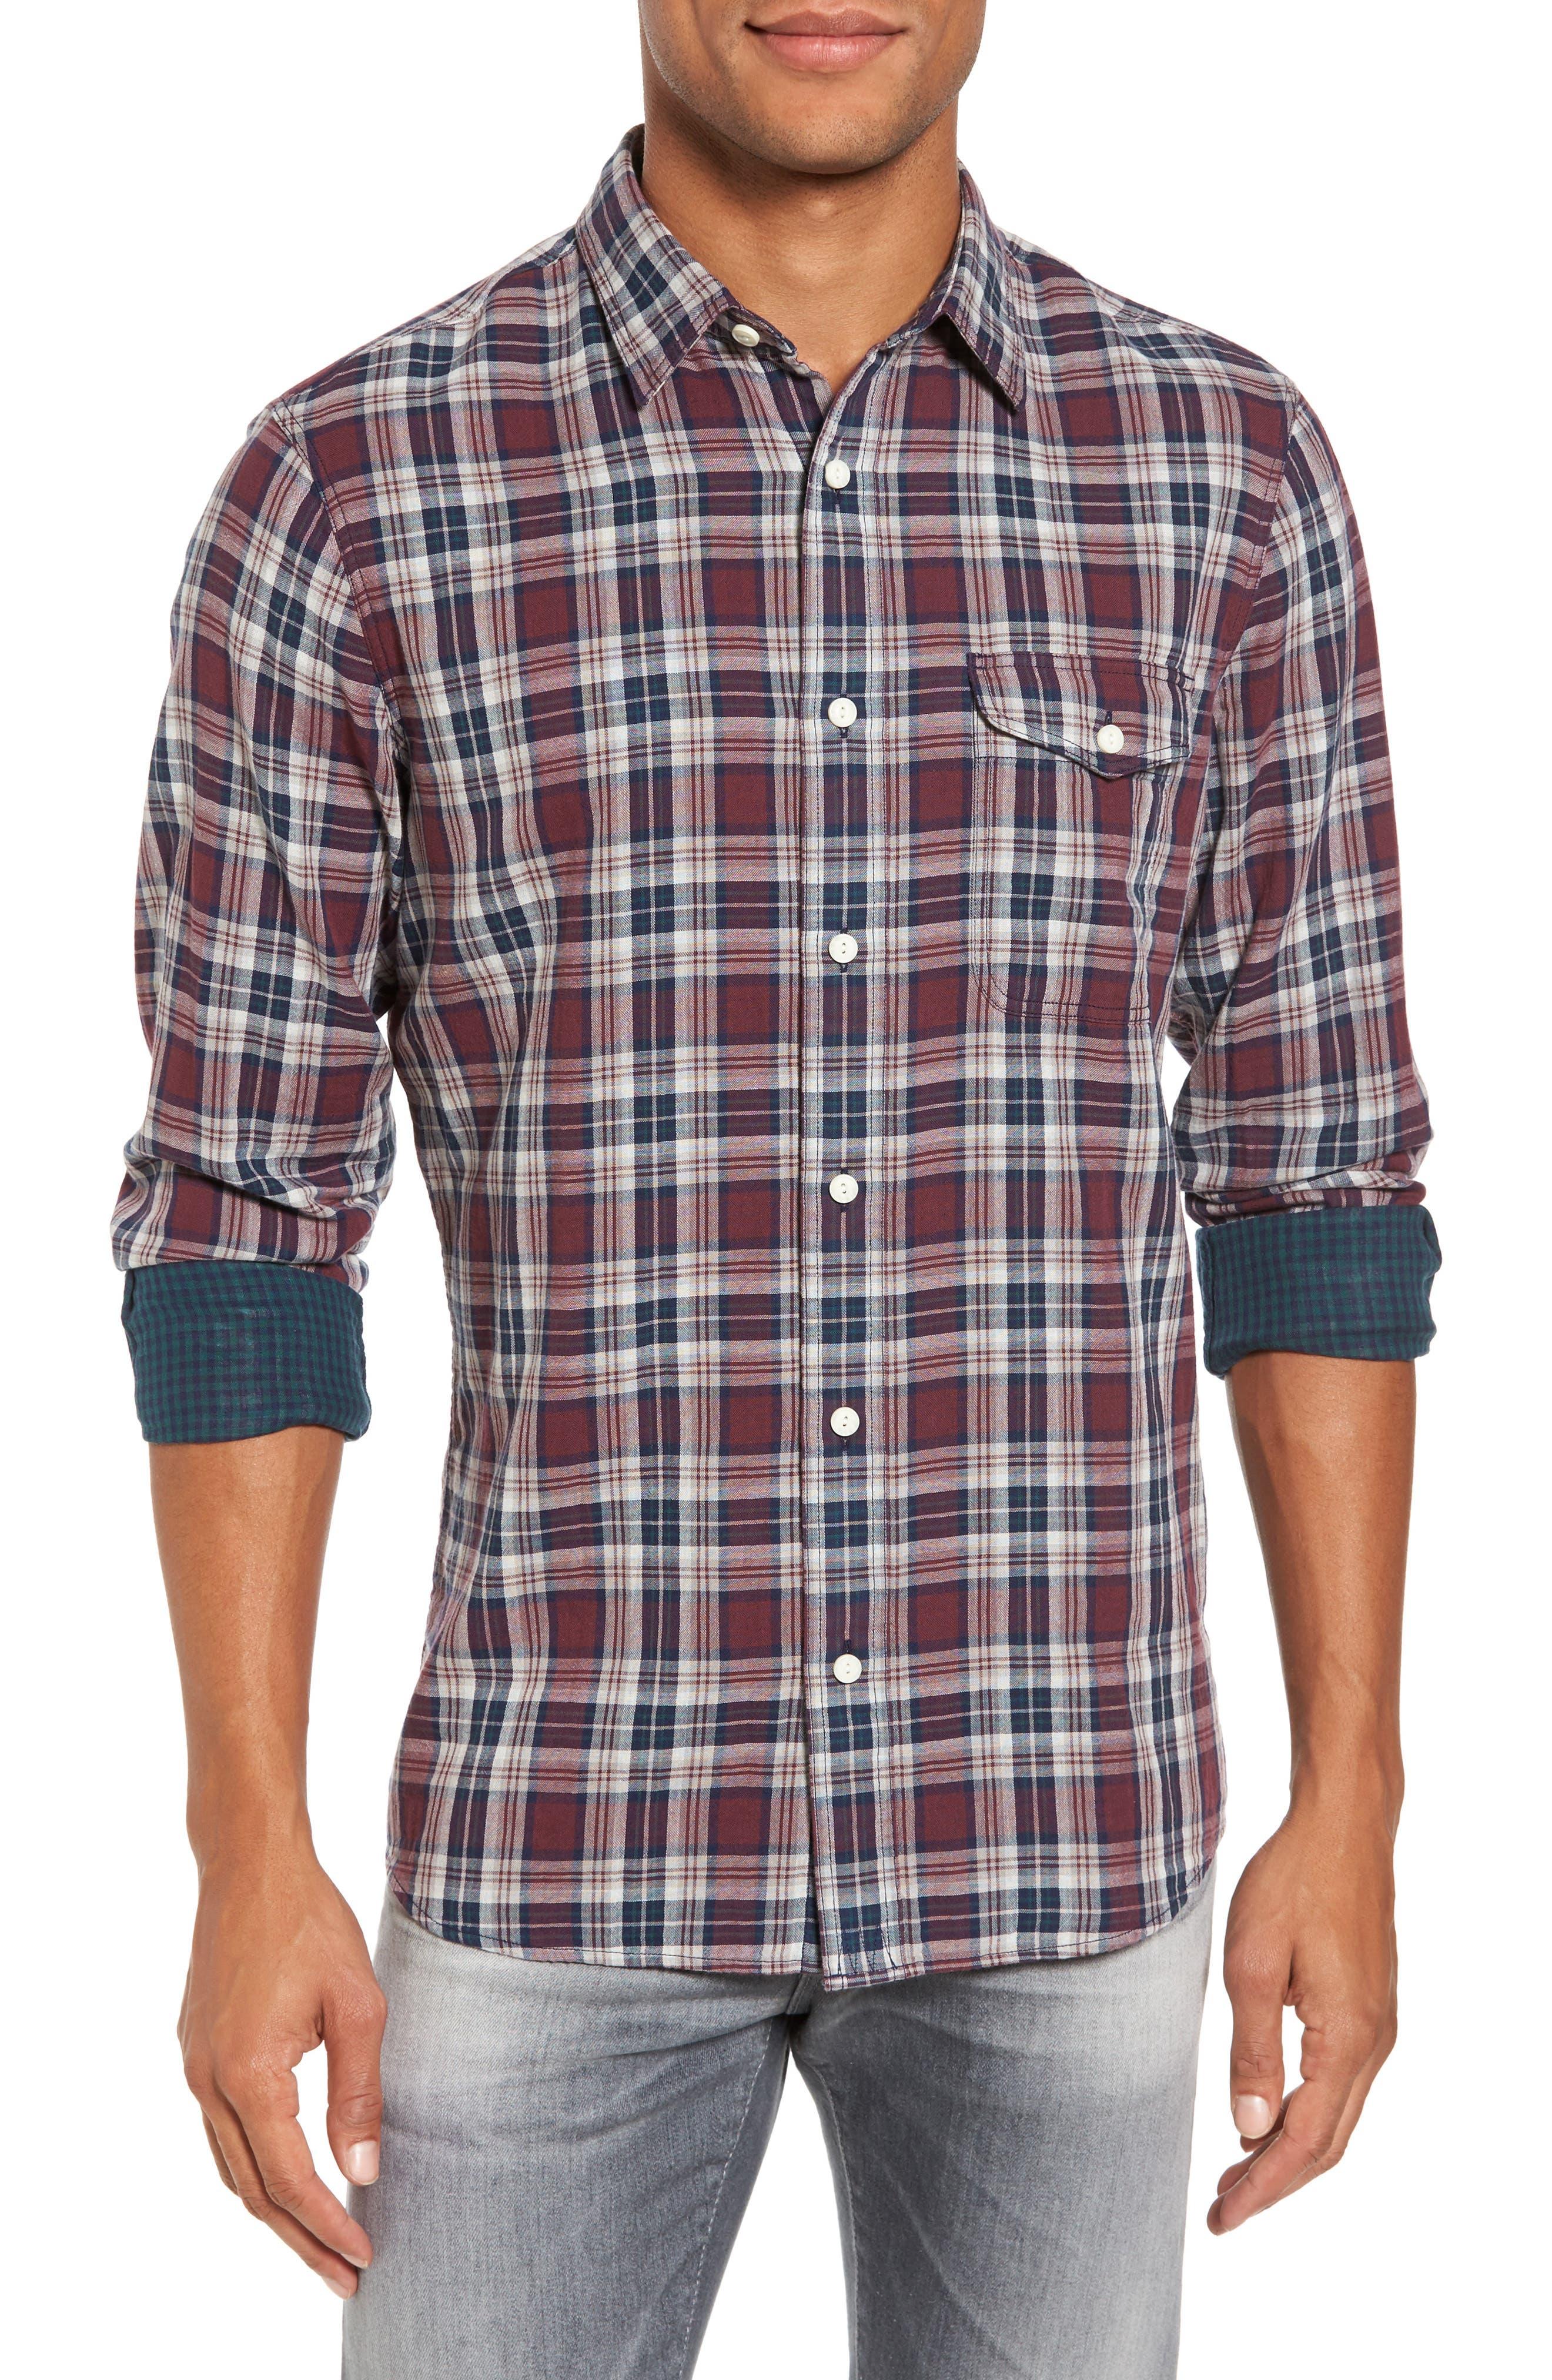 Lumber Duofold Slim Fit Plaid Shirt,                         Main,                         color, Burgundy Royale Tartan Duofold